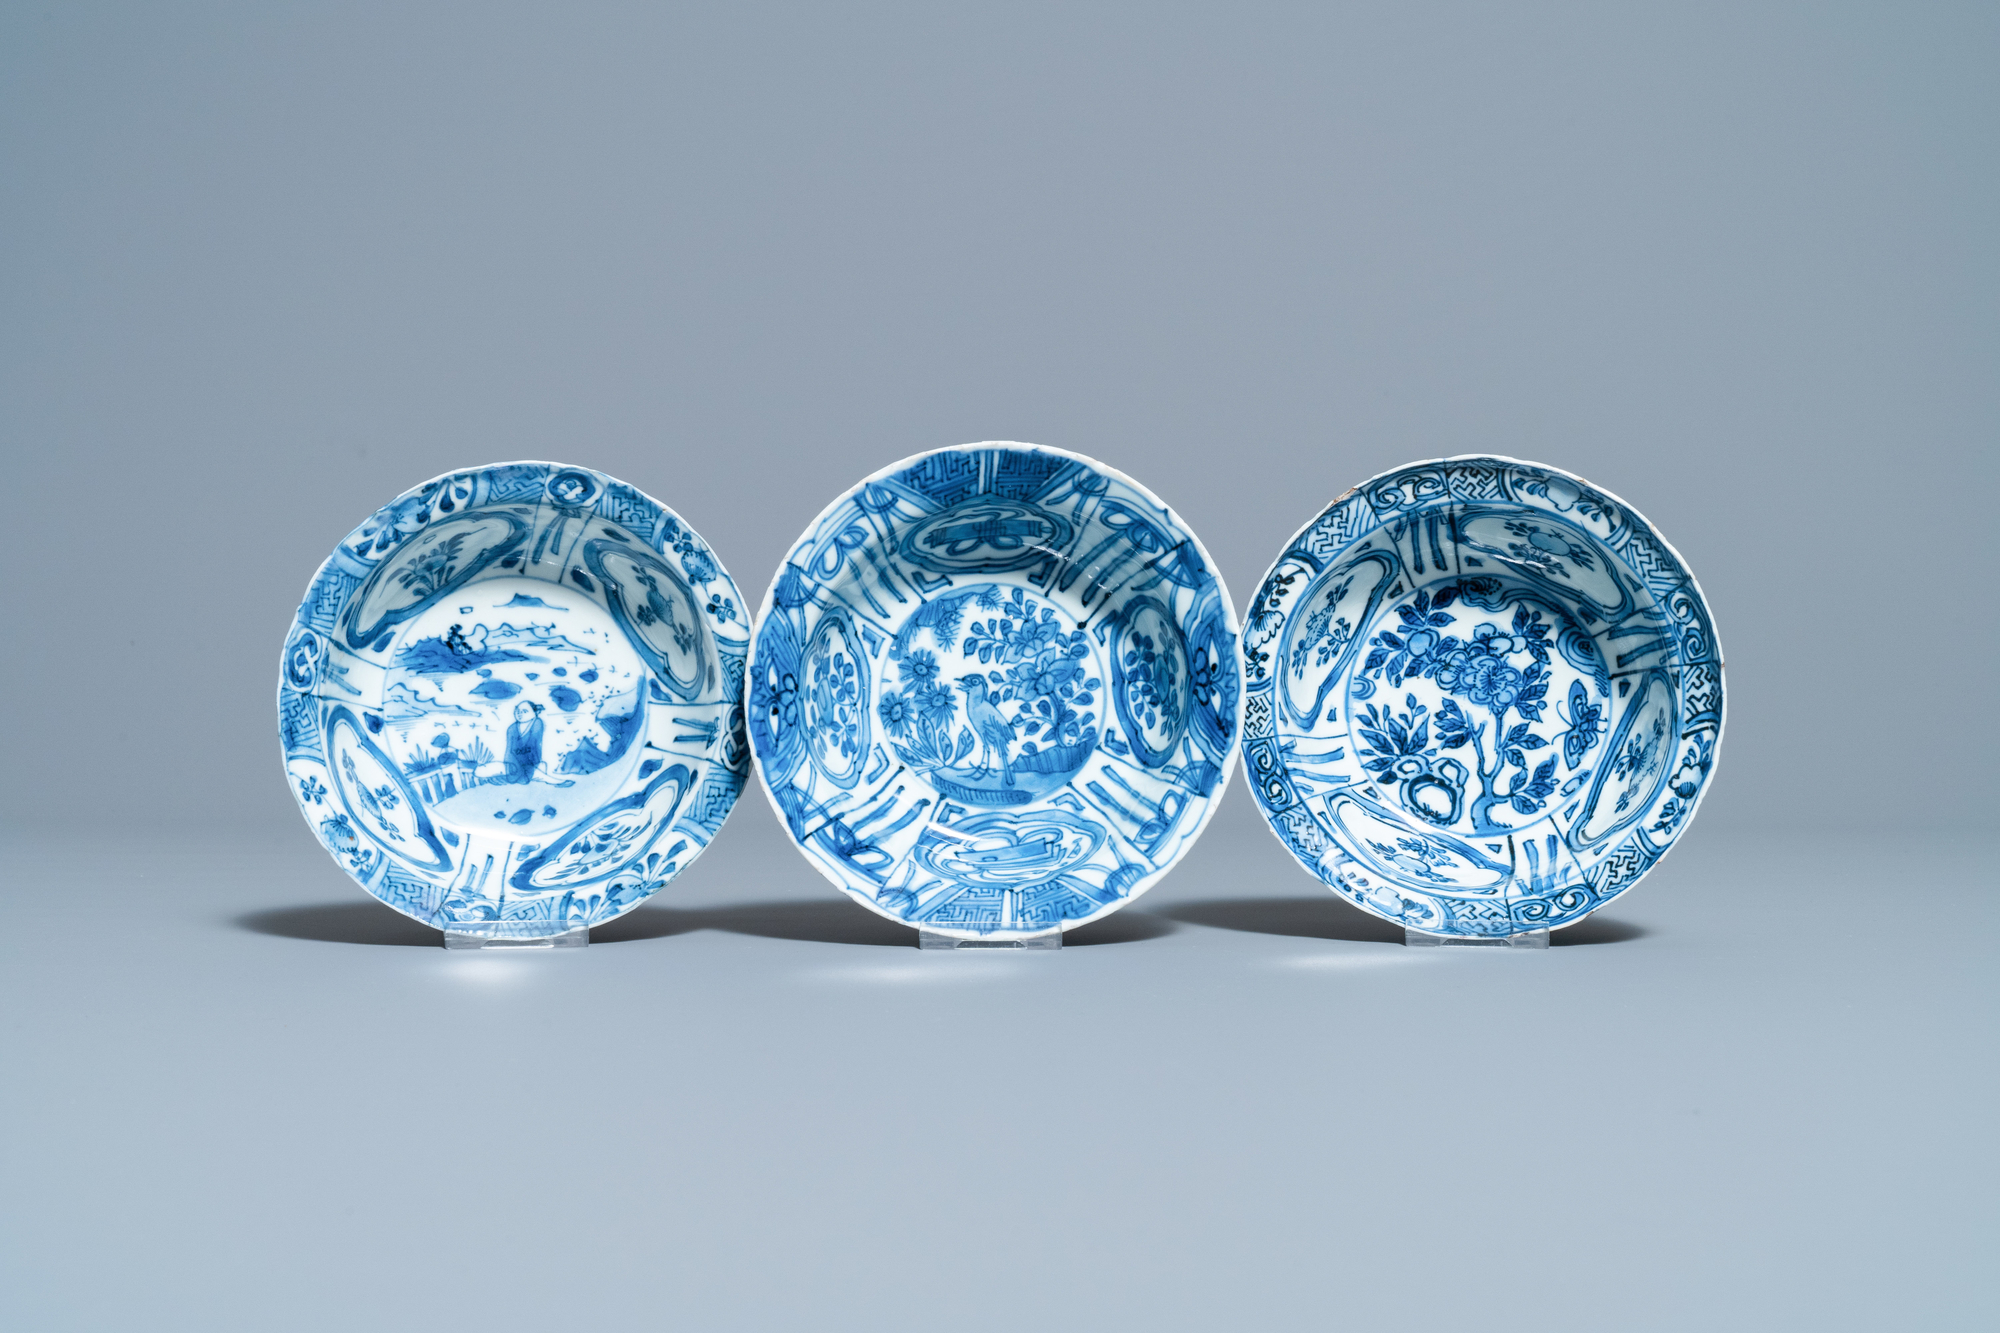 Three Chinese blue and white kraak porcelain klapmuts bowls, Wanli